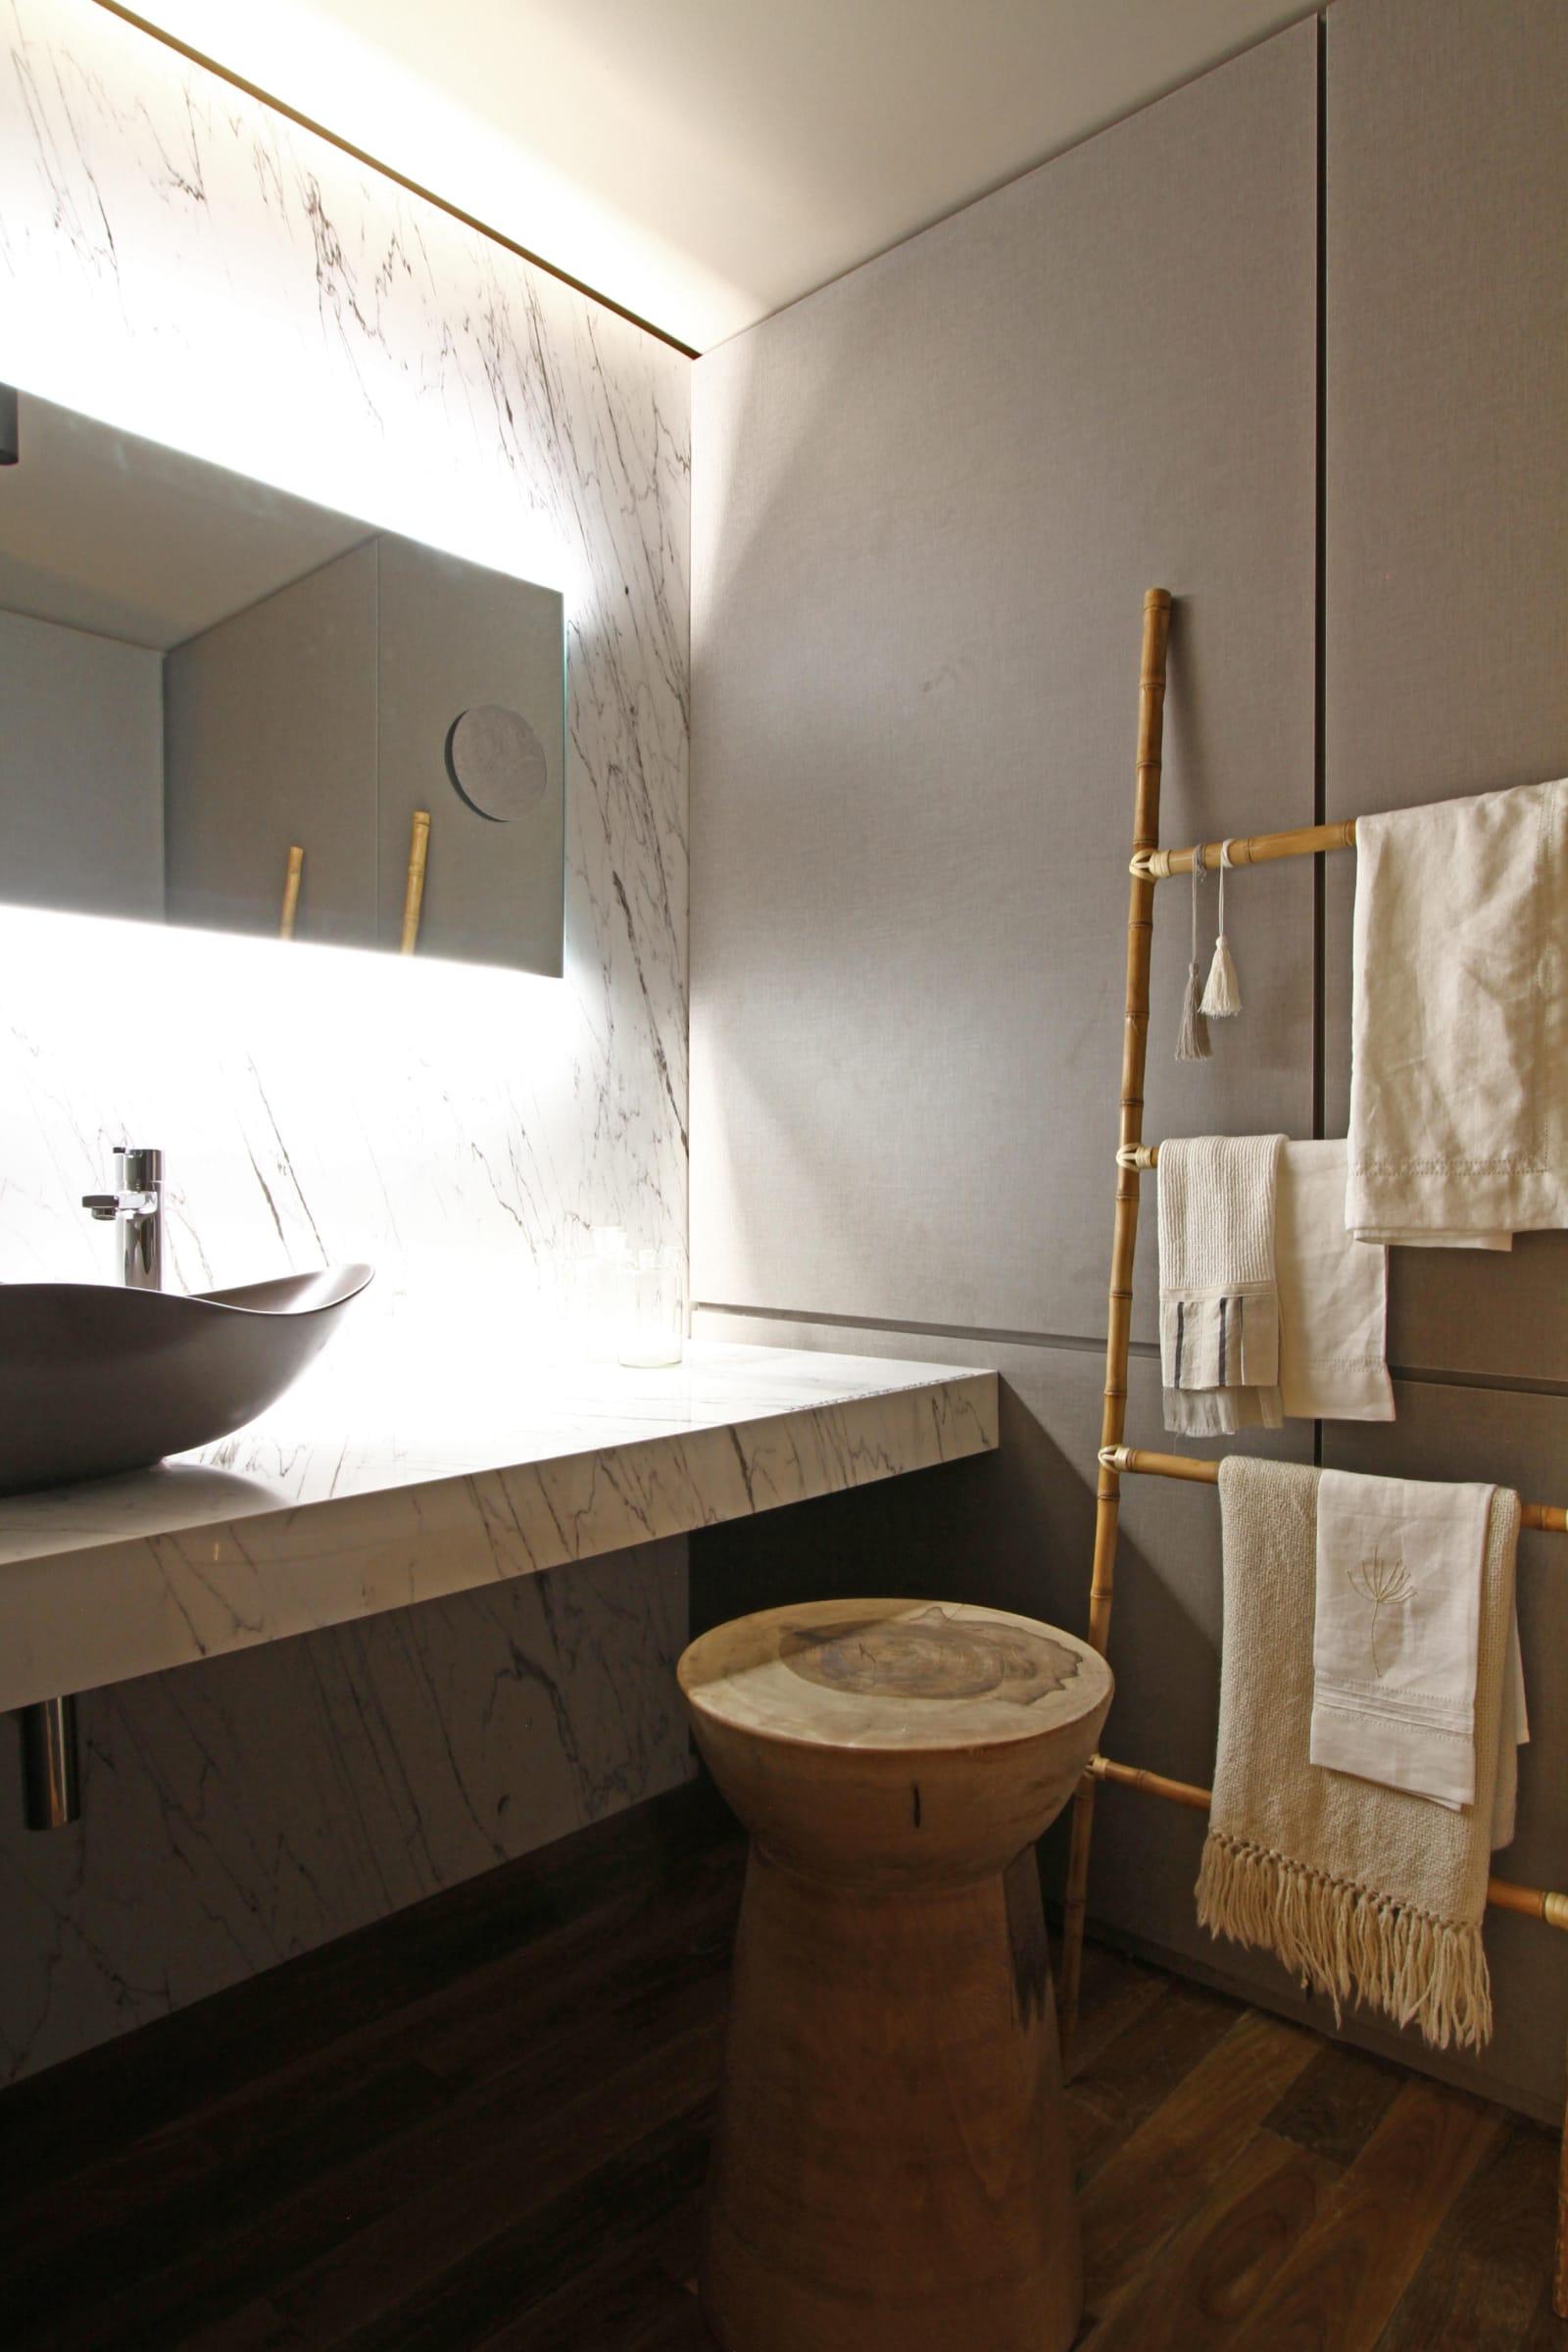 Toilette con mesada Marmotech Estuario Milano, Bacha Ruy Ohtake 540, color café y griferia Naia (Roca).